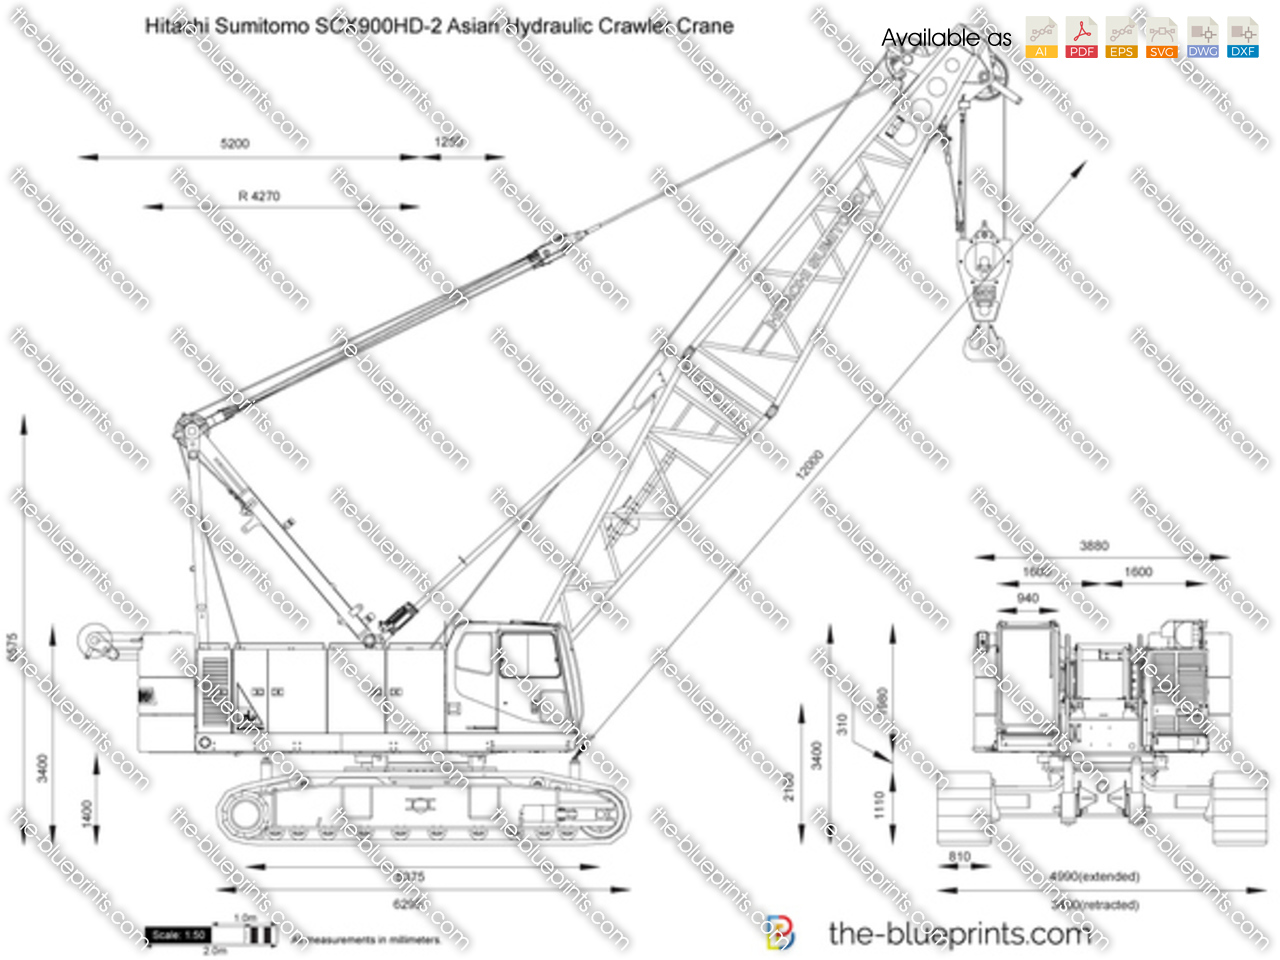 Hitachi Sumitomo SCX900HD-2 Asian Hydraulic Crawler Crane